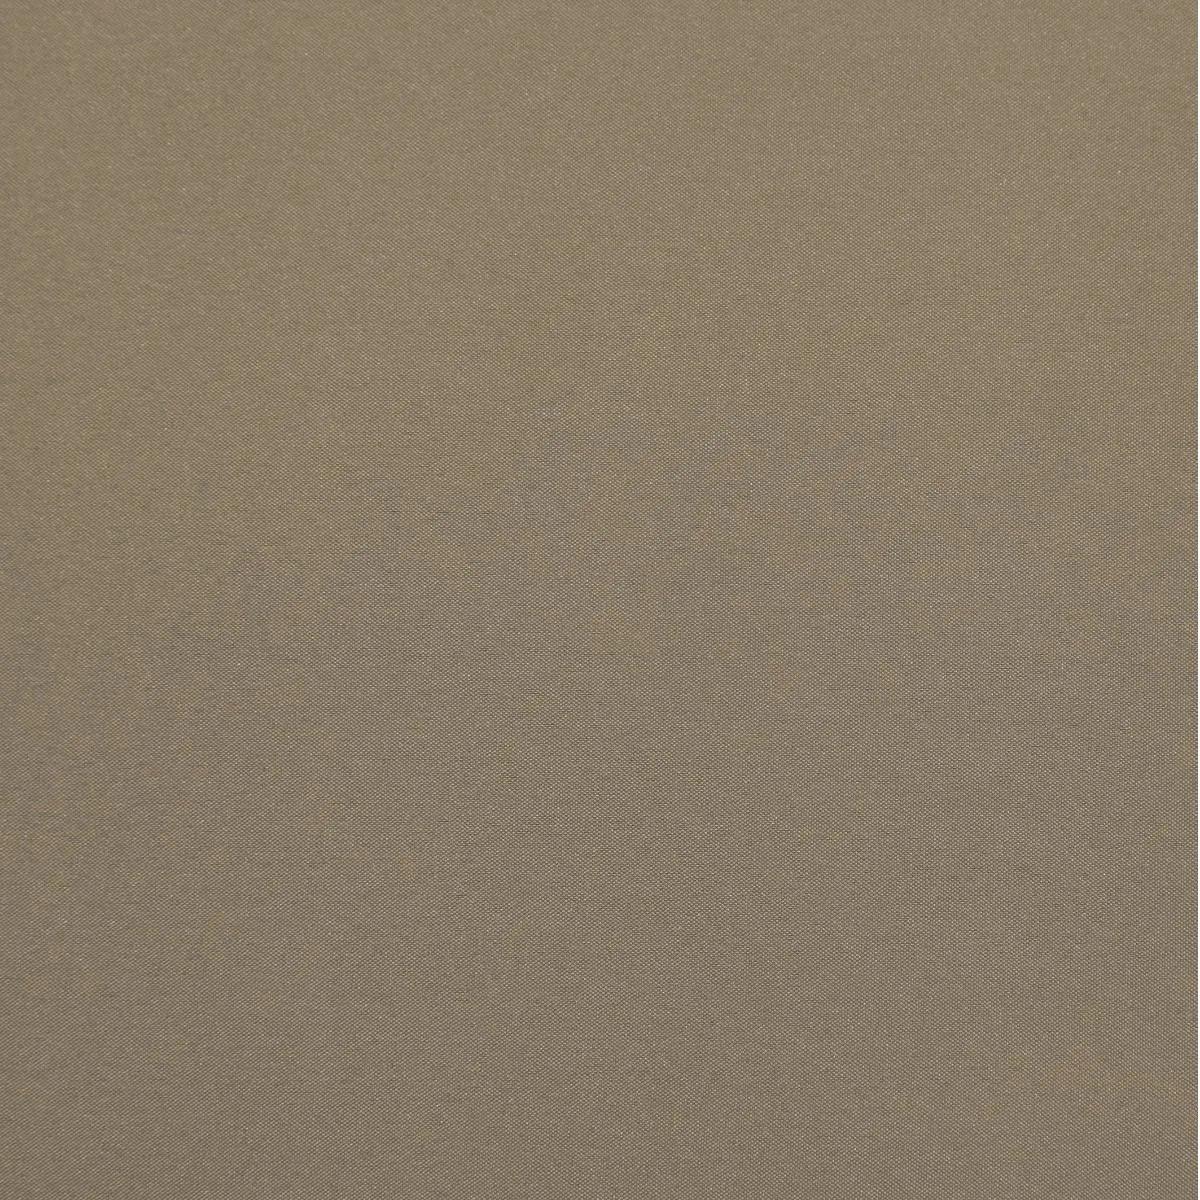 Cortina Blackout 100% Comfort Taupe 4,20 x 2,50 Bella Janela